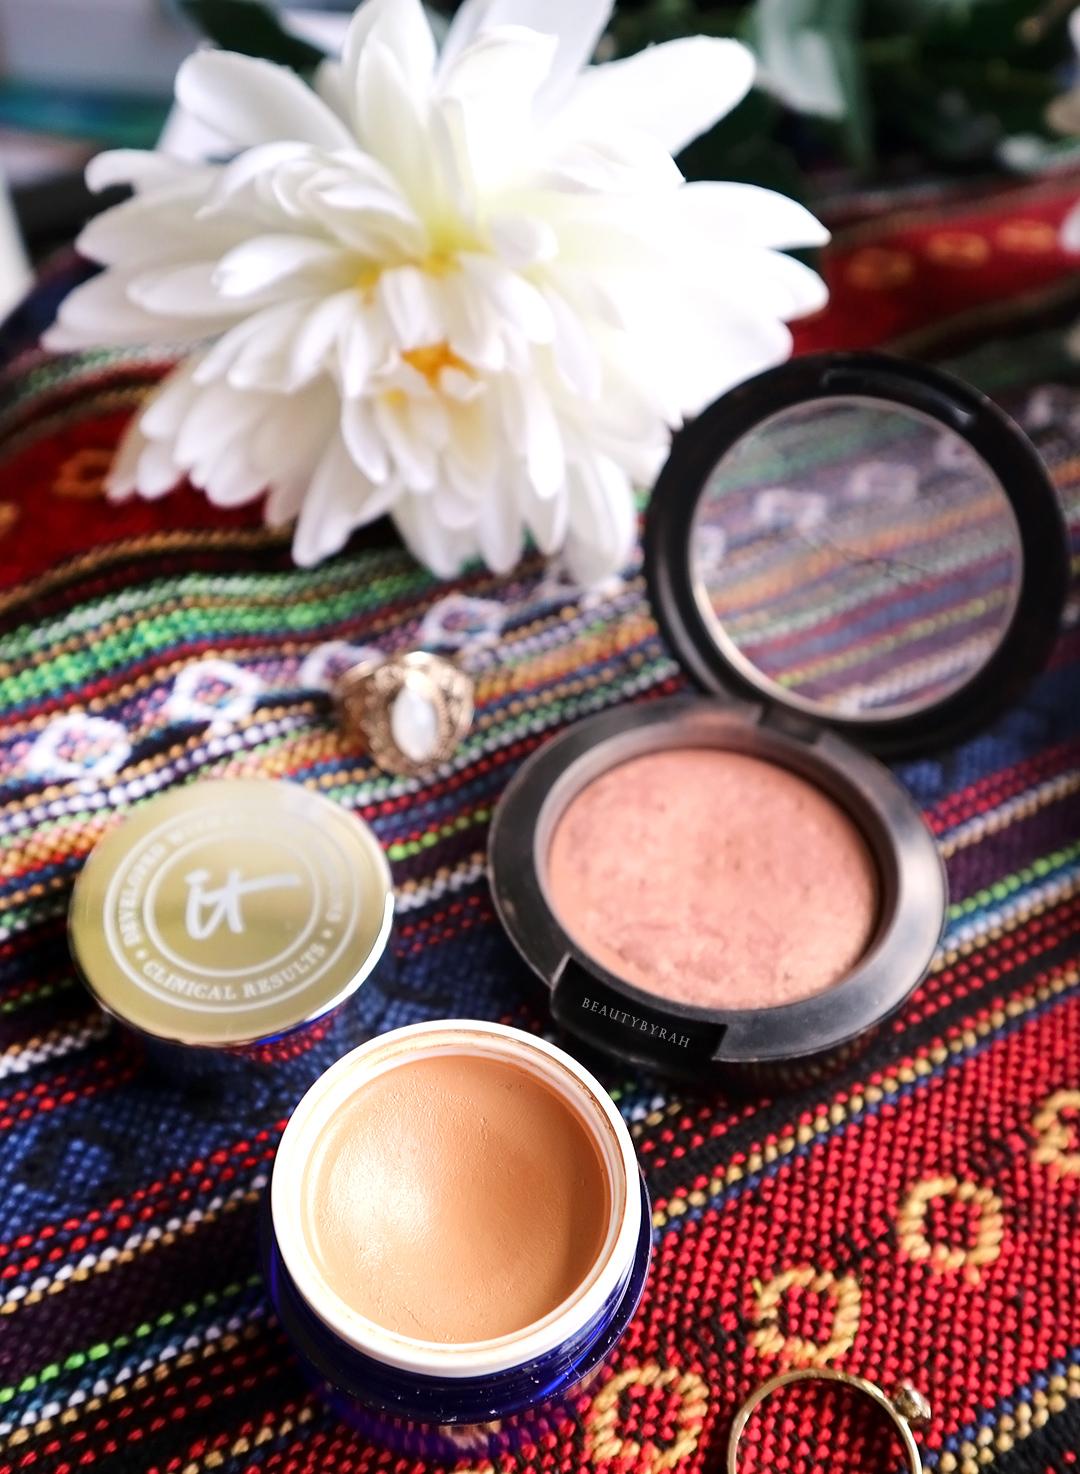 It Cosmetics Bye Bye Undereye Corrector and MAC Warm Soul review